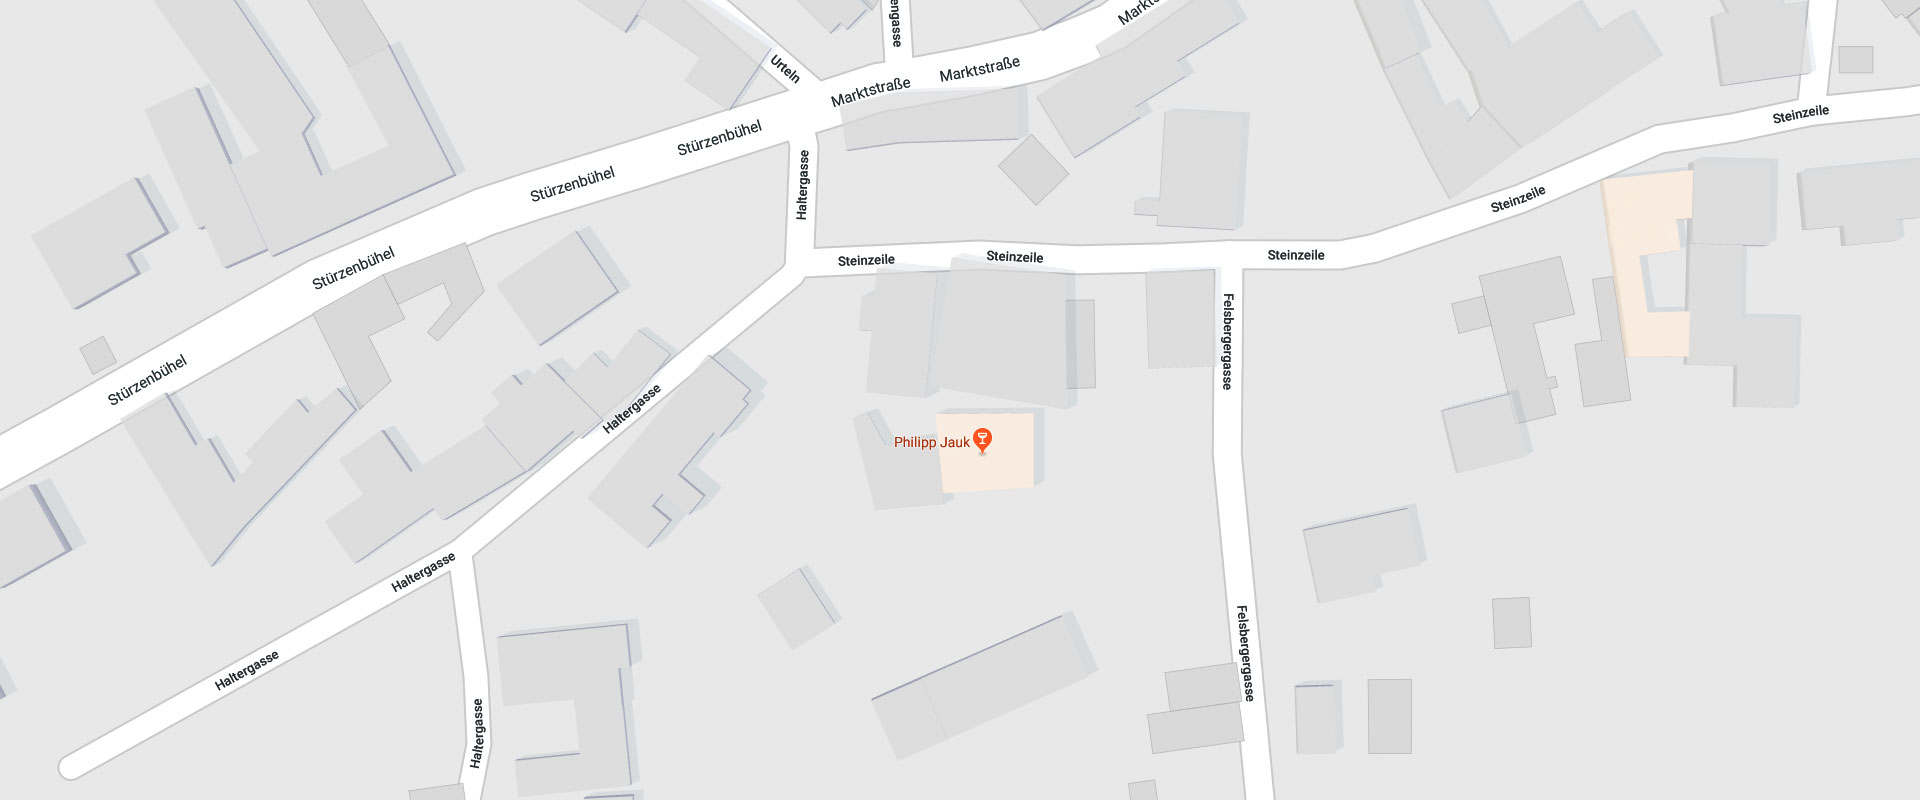 Weingut-Map-02